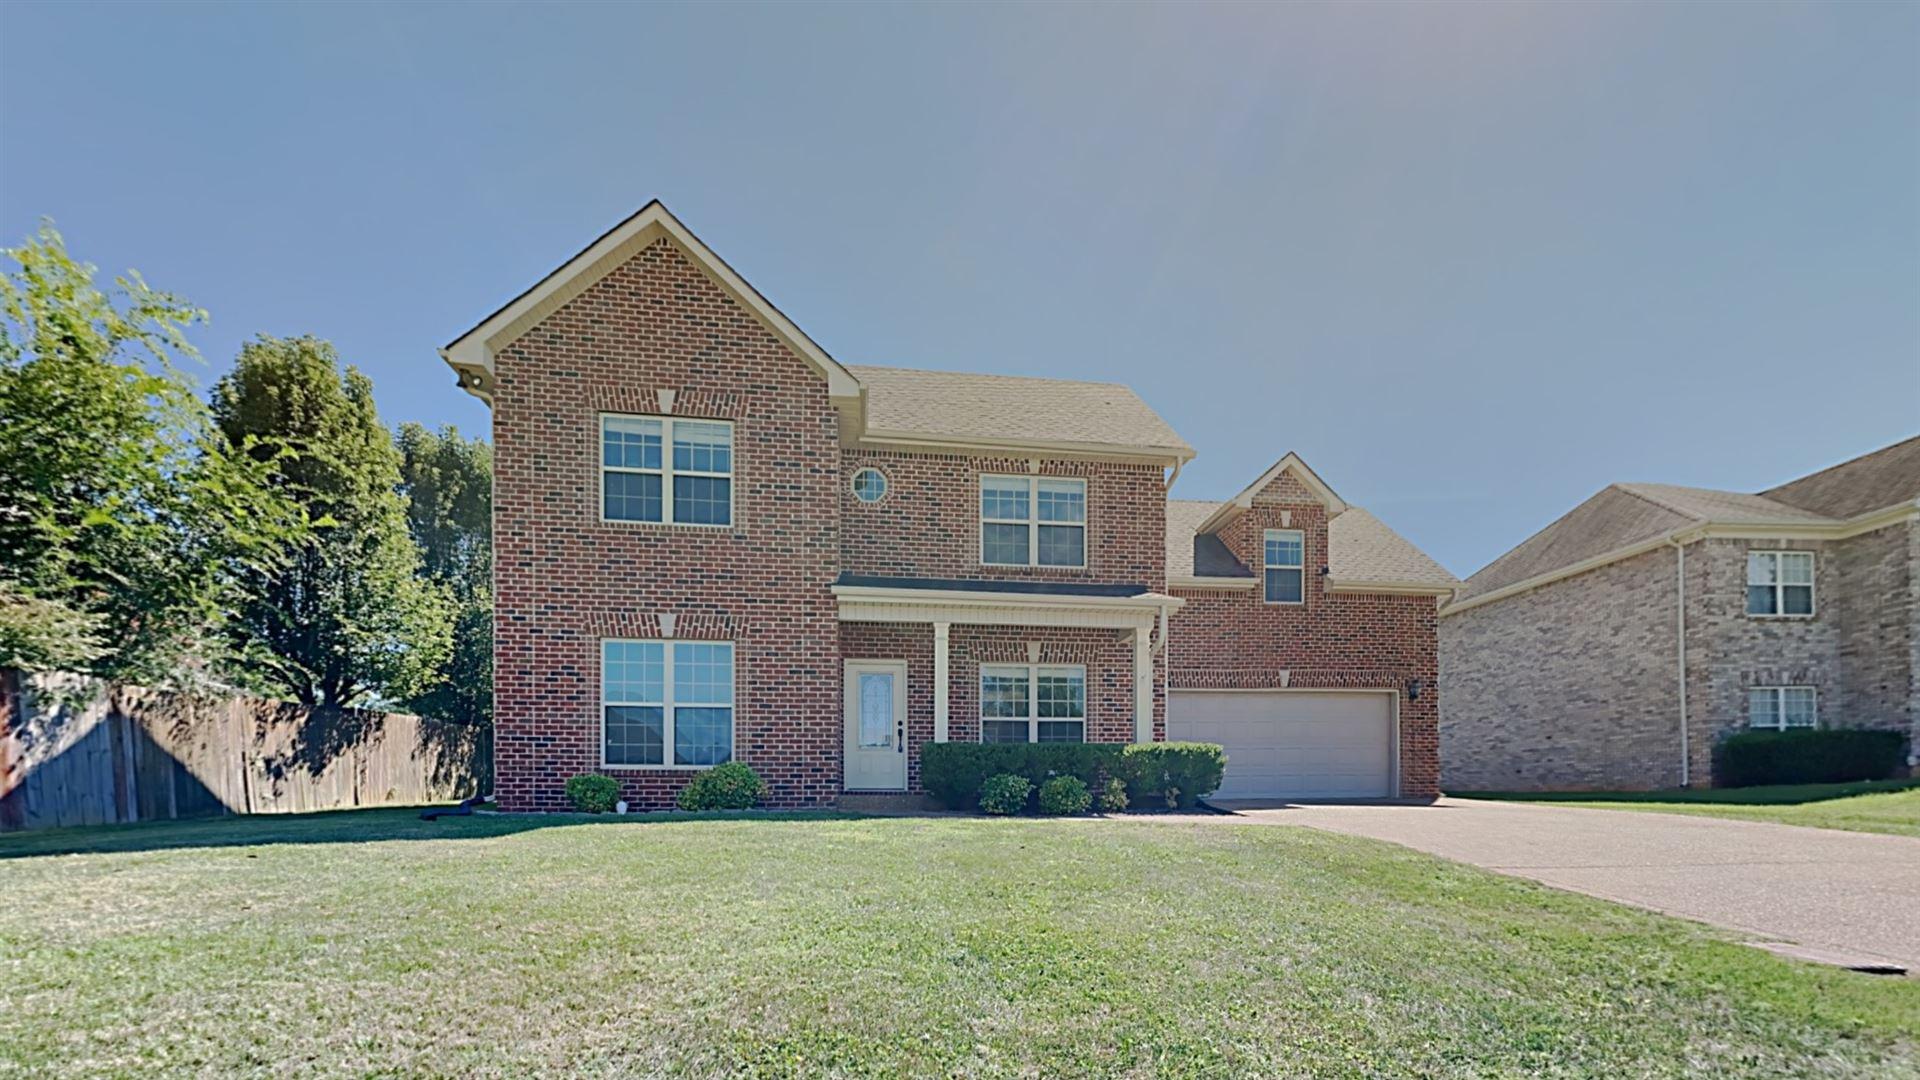 732 Willow Cove Dr, Murfreesboro, TN 37128 - MLS#: 2290090